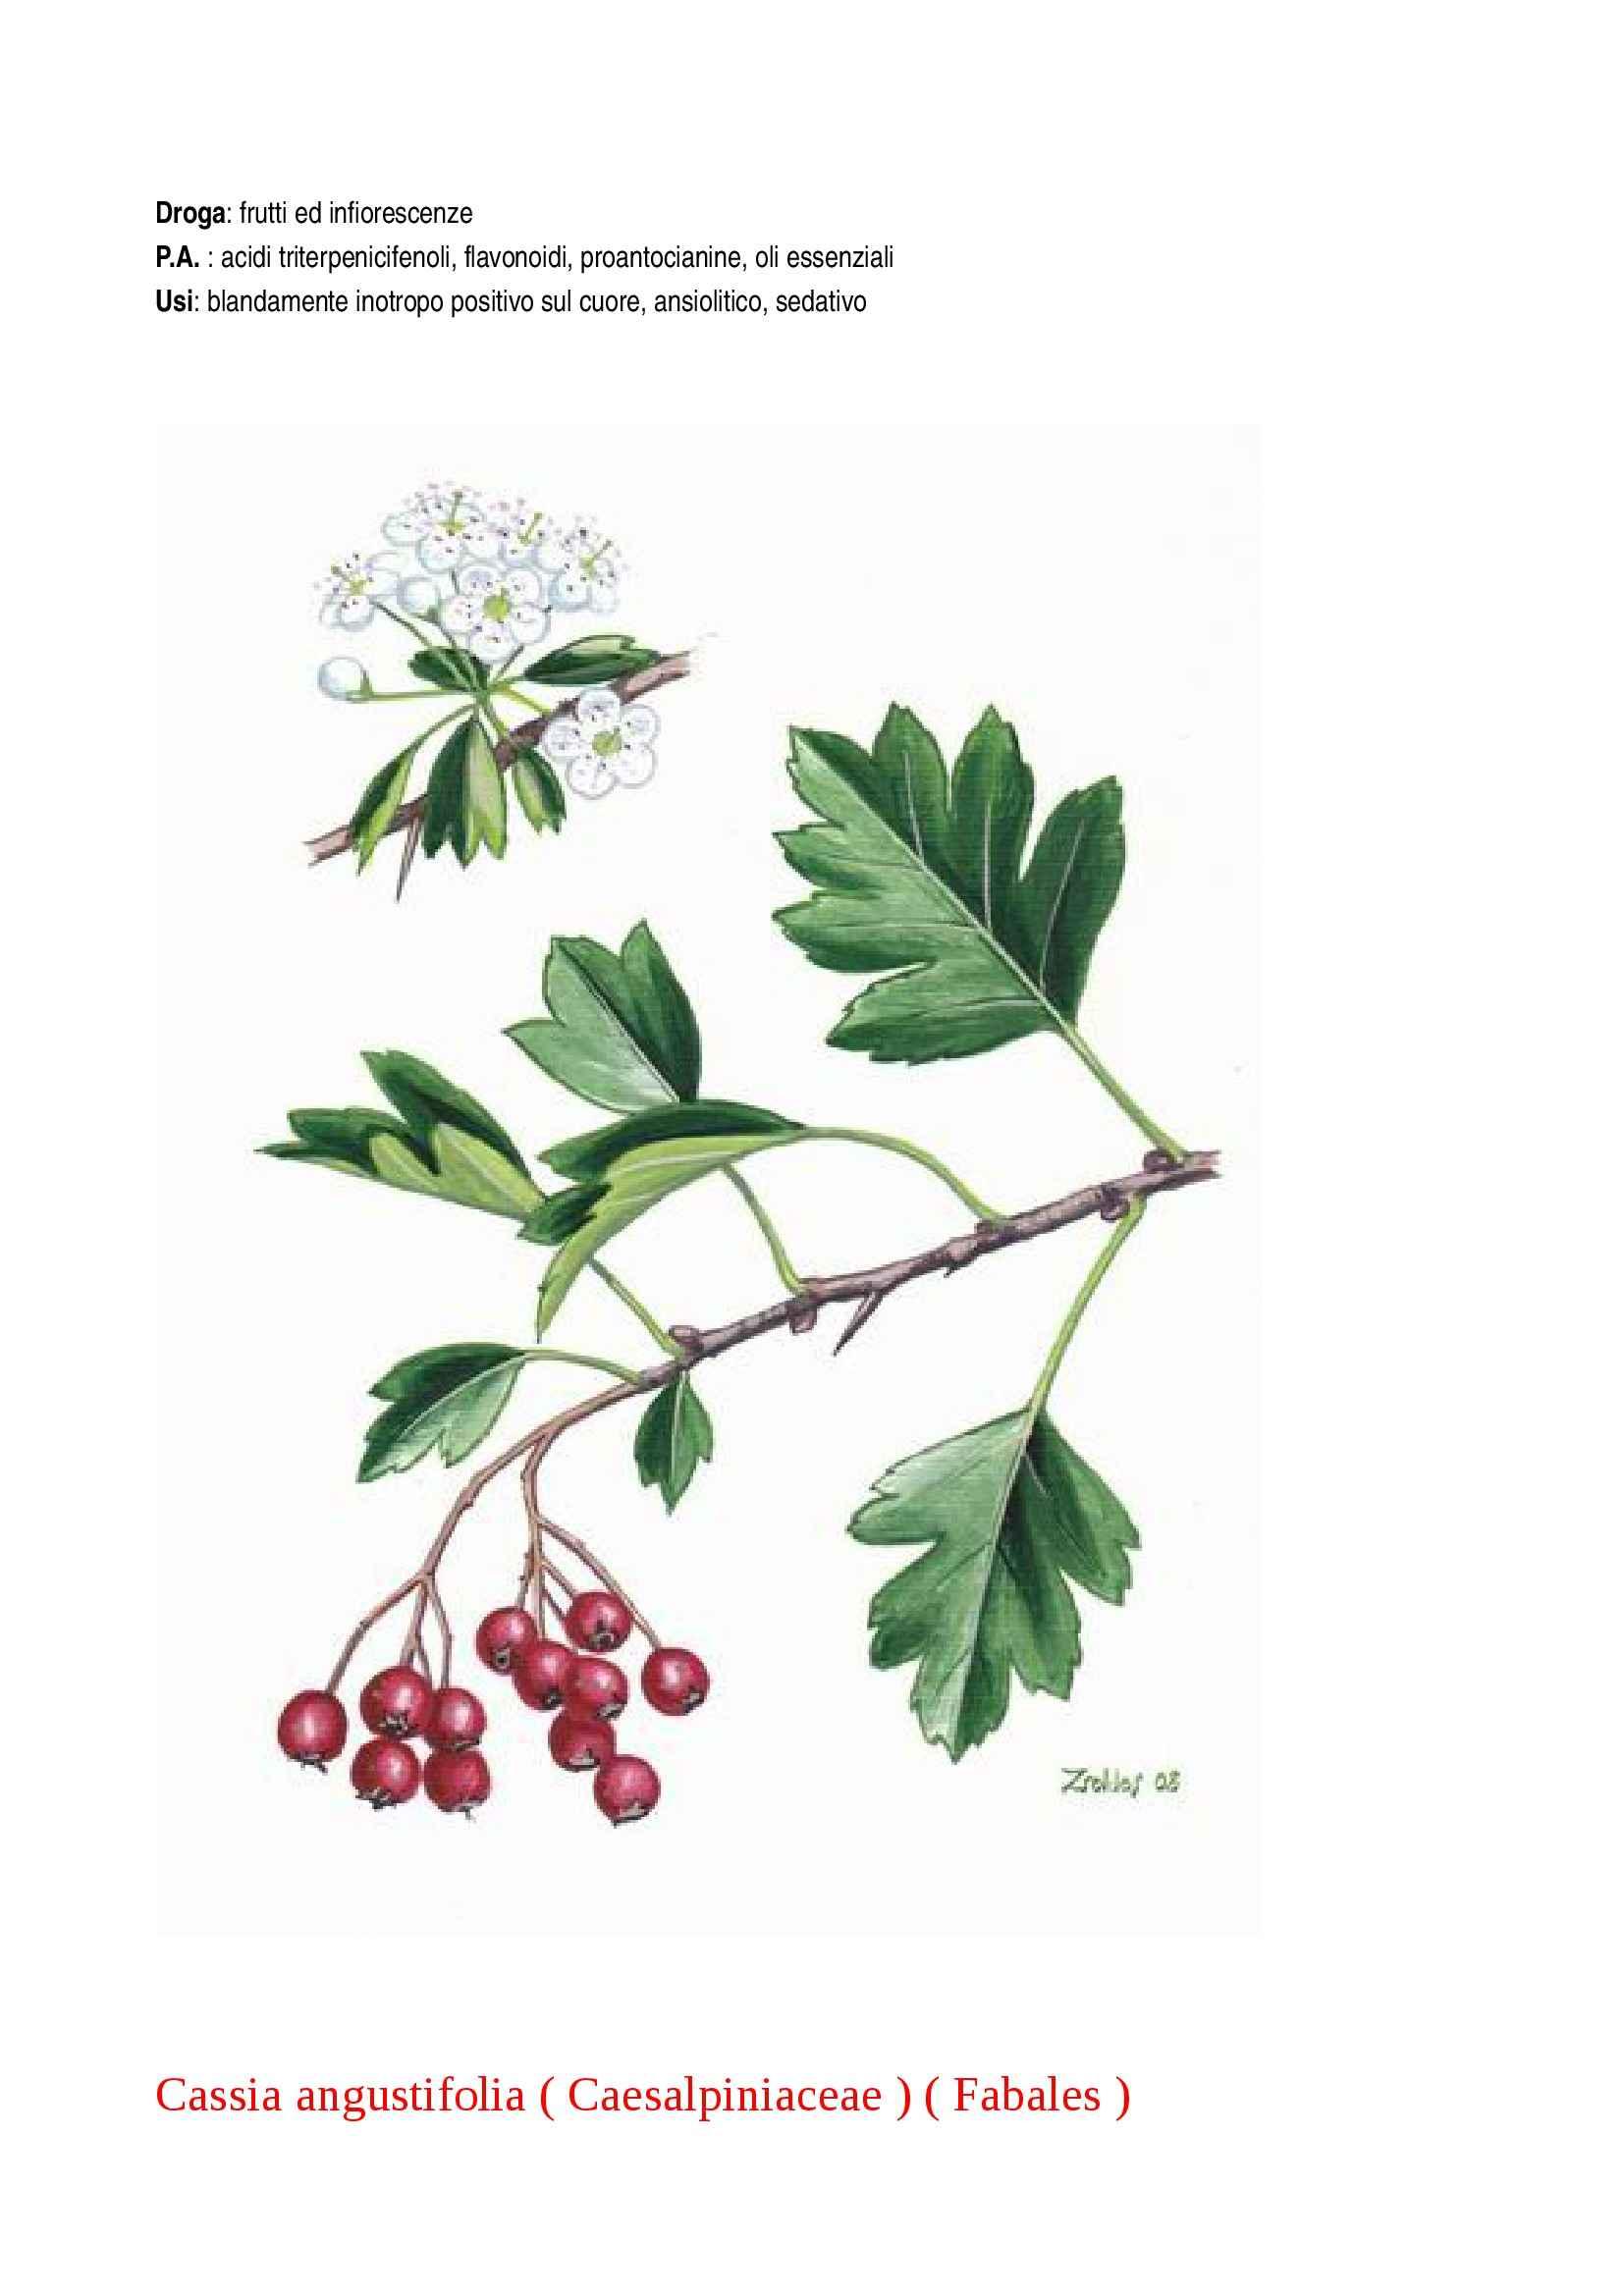 Botanica farmaceutica Pag. 31